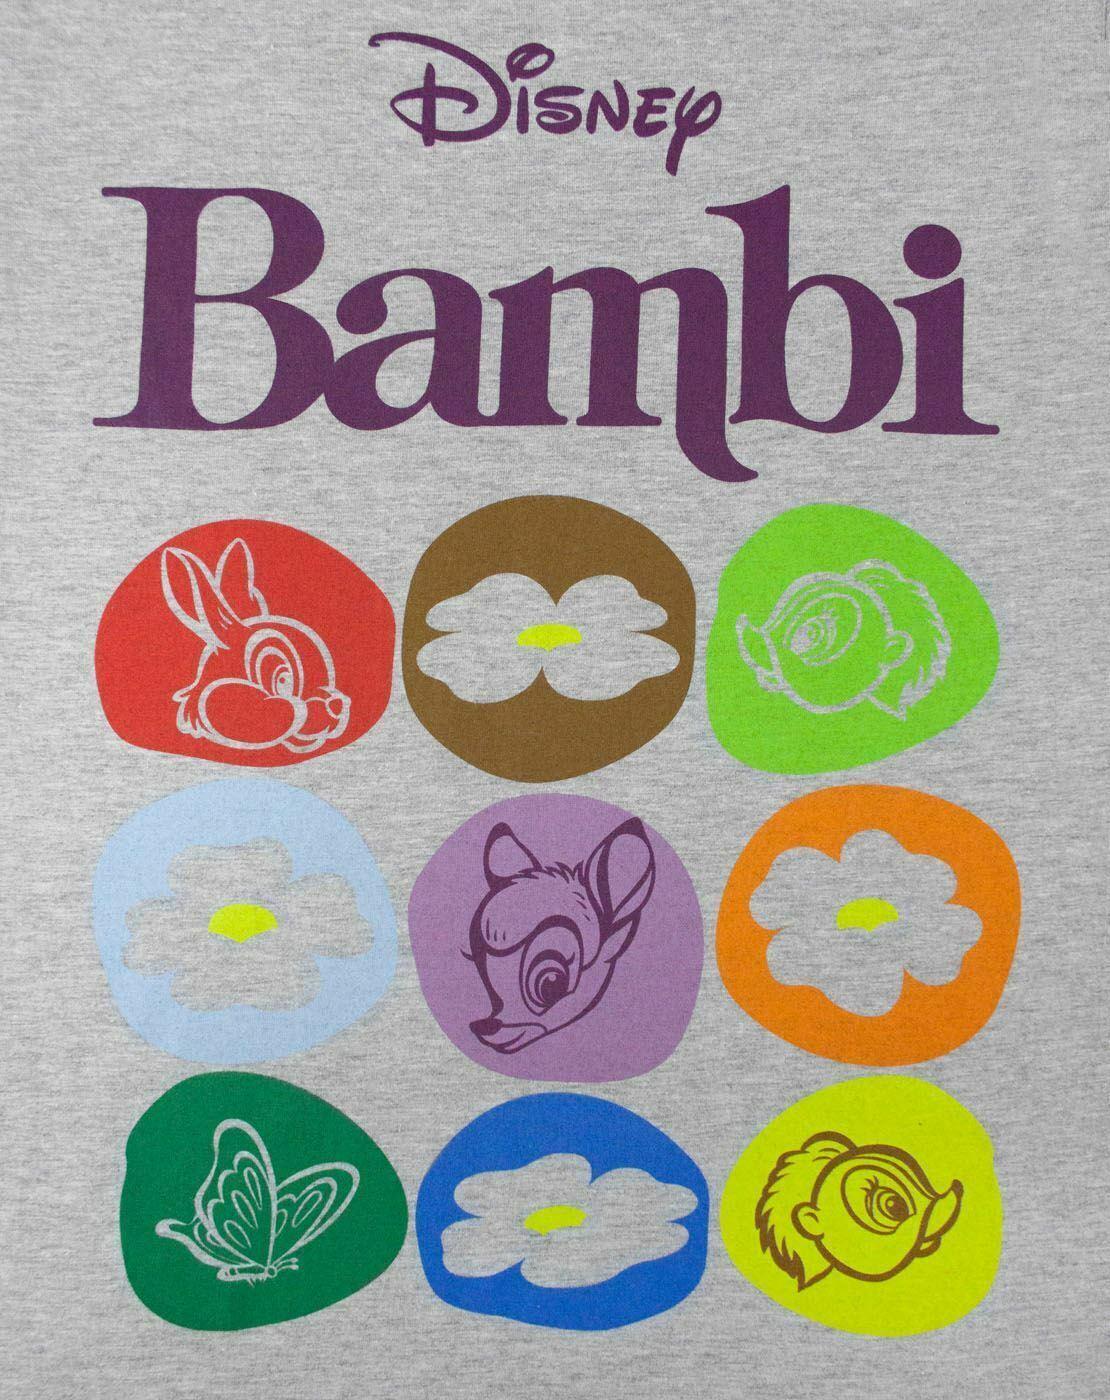 Disney-Bambi-Motif-Women-039-s-T-Shirt thumbnail 7